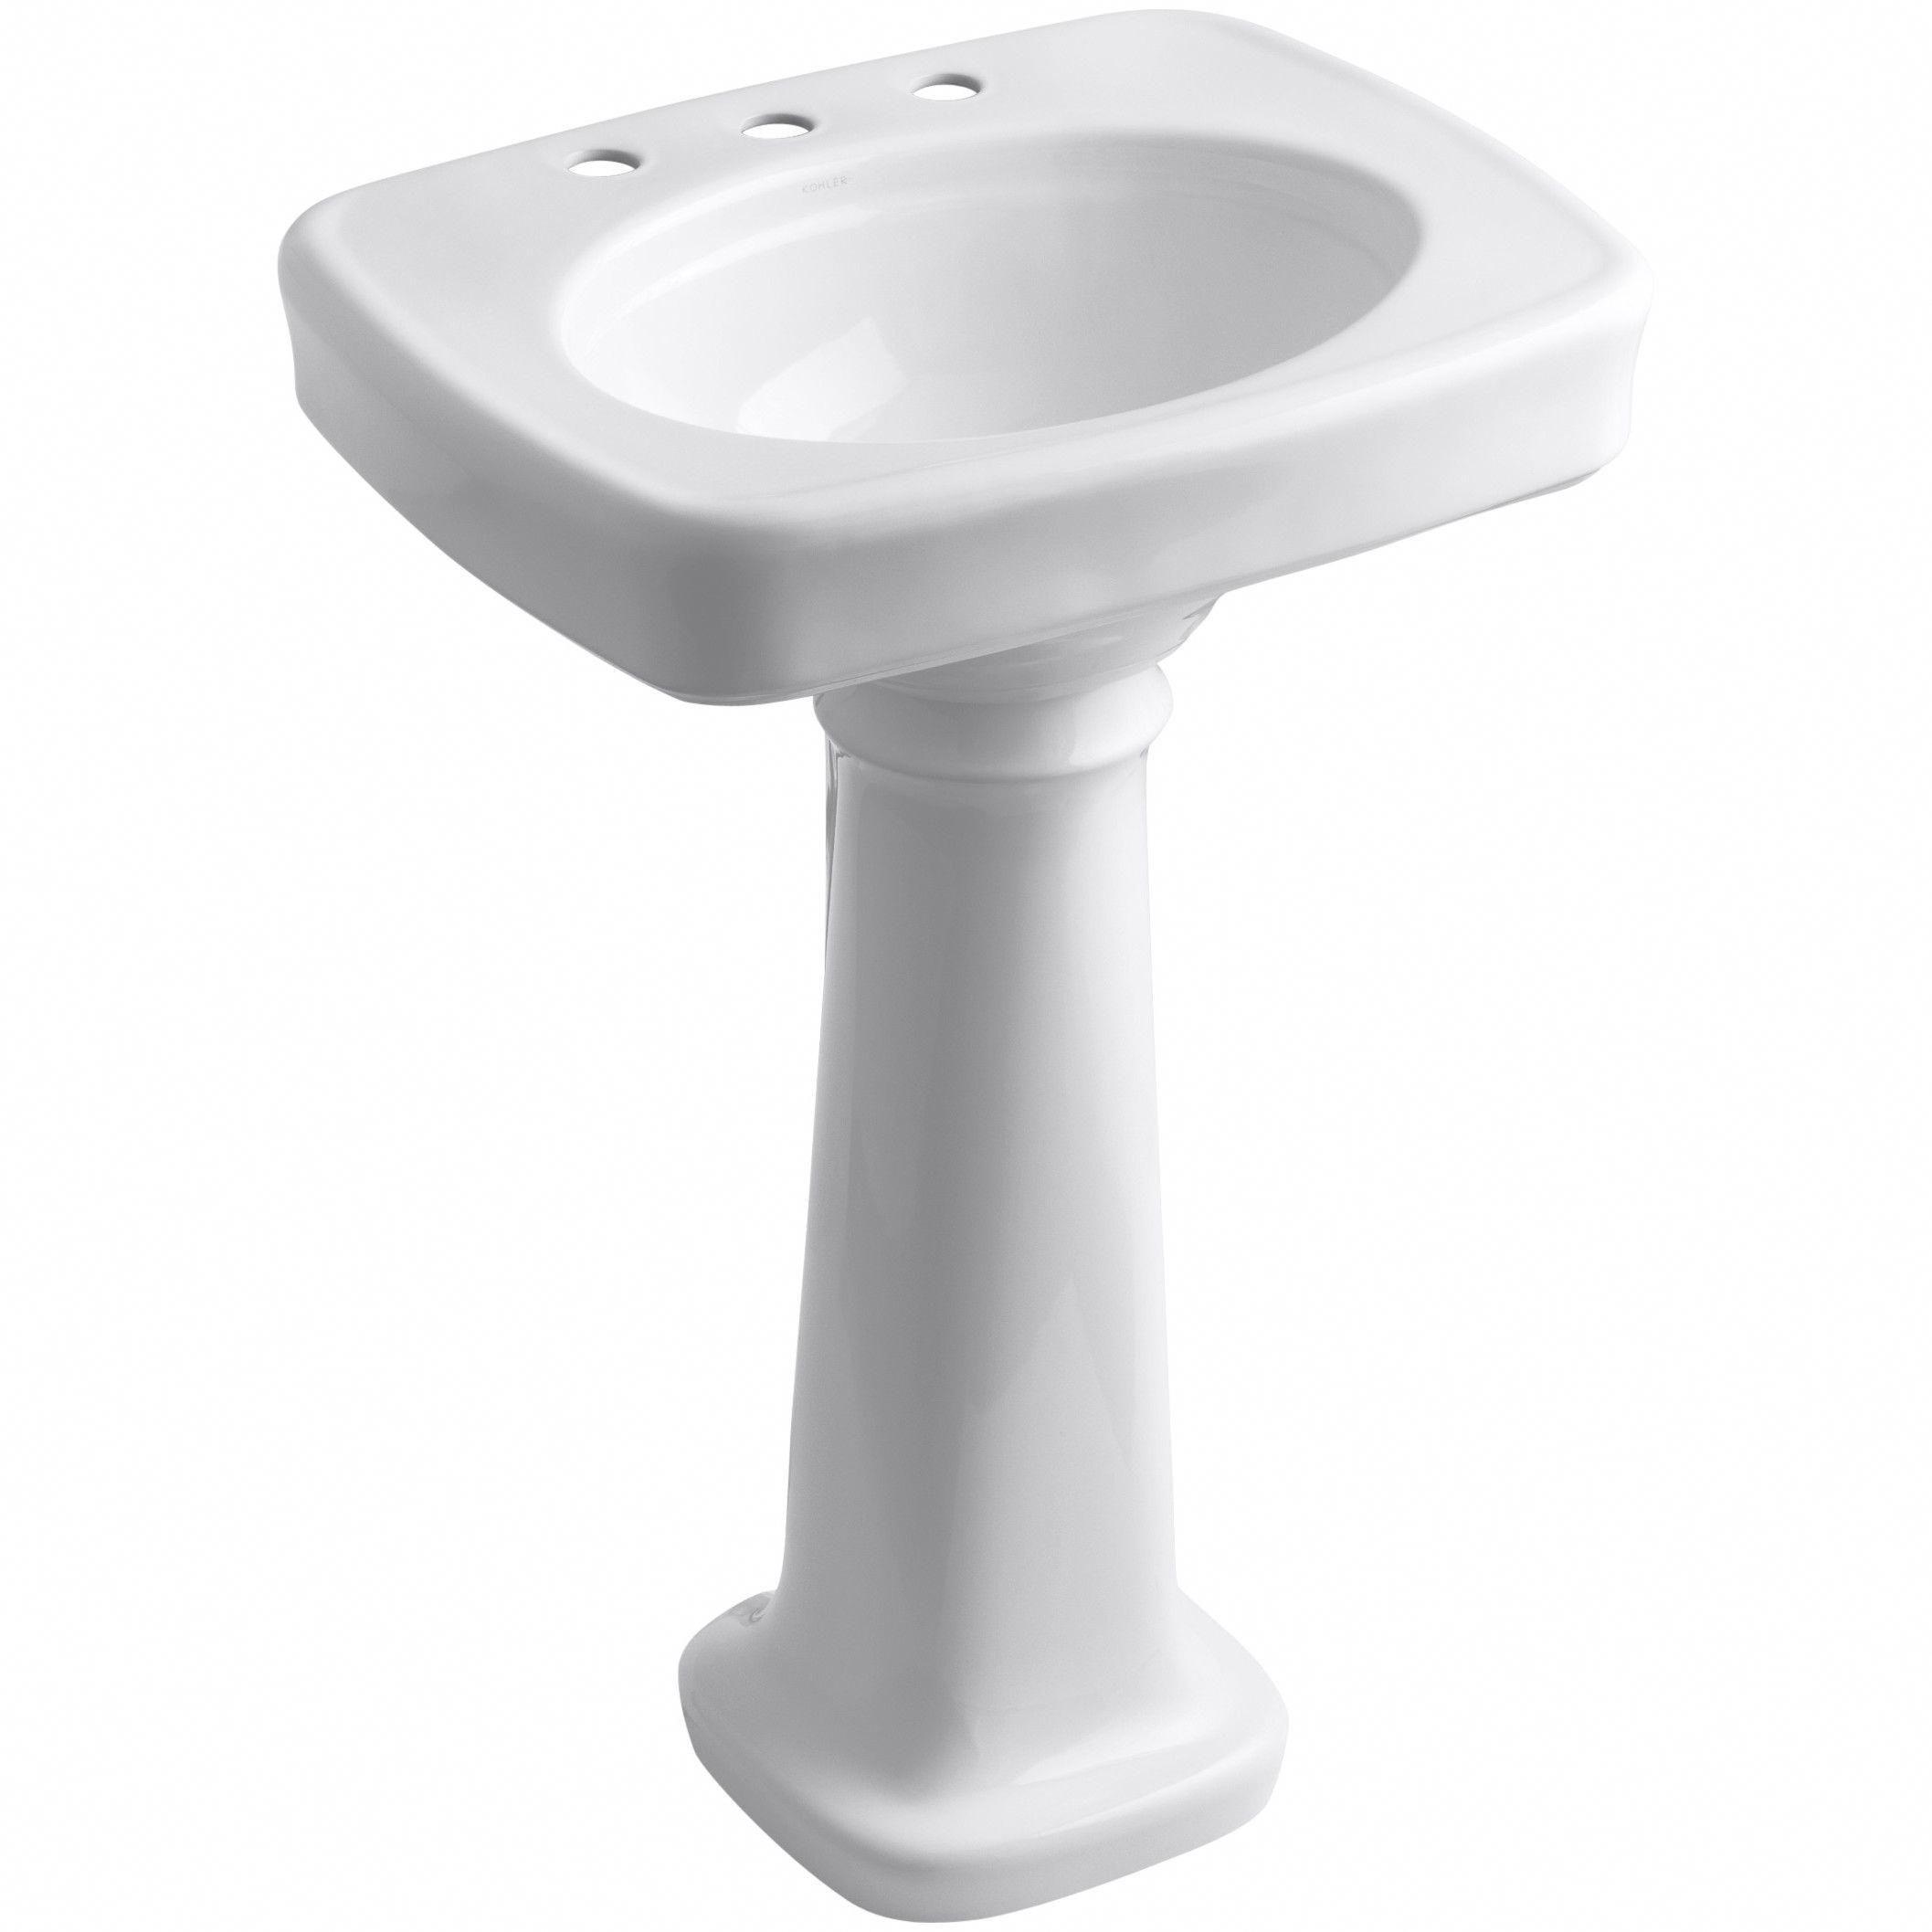 Kohler Bancroft 24 Pedestal Bathroom Sink With 8 Widespread Faucet Holes Reviews Wayfair Bathroomi Rectangular Sink Bathroom Pedestal Sink Bathroom Sink